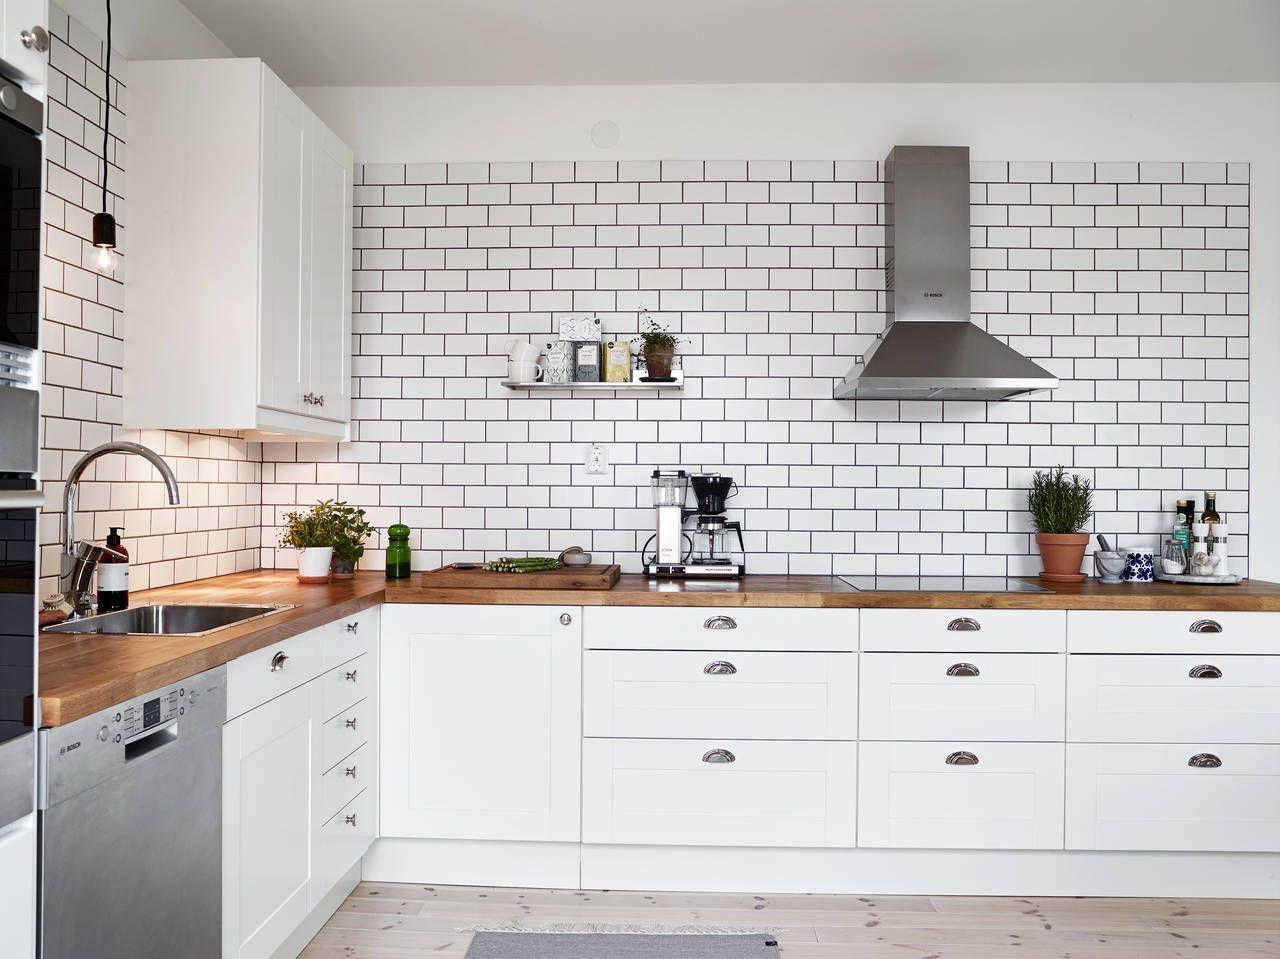 Download Wallpaper White Kitchen Tiles Images